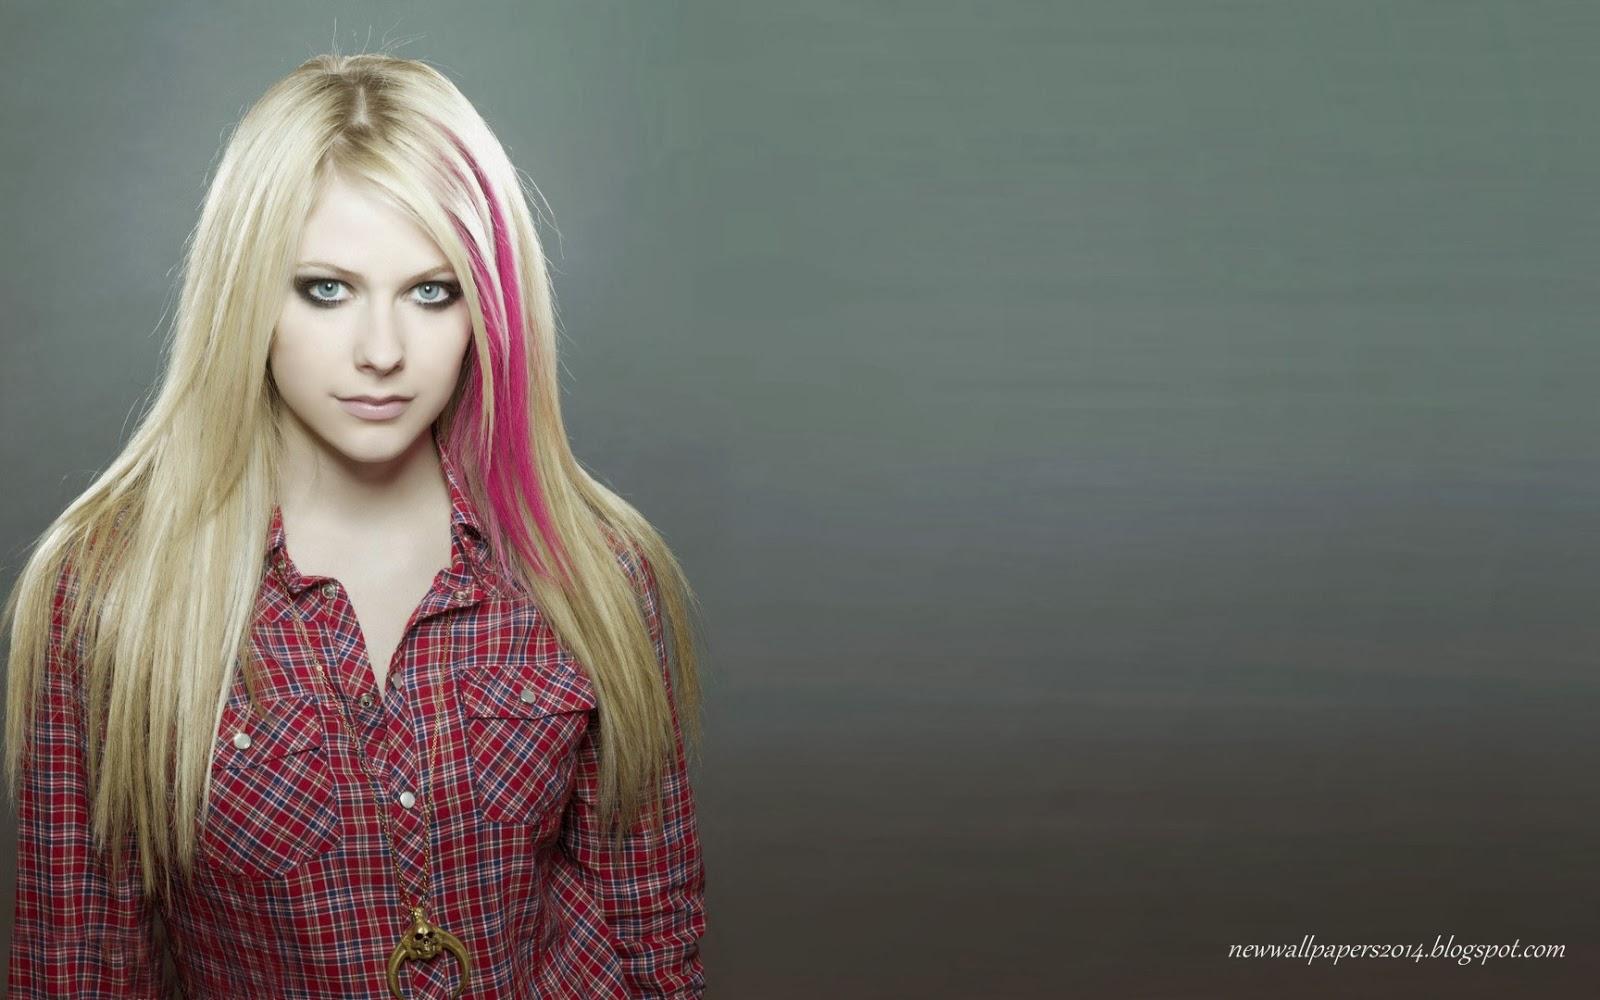 Avril Lavigne 1 Wallpapers: Avril Lavigne HD Wallpapers